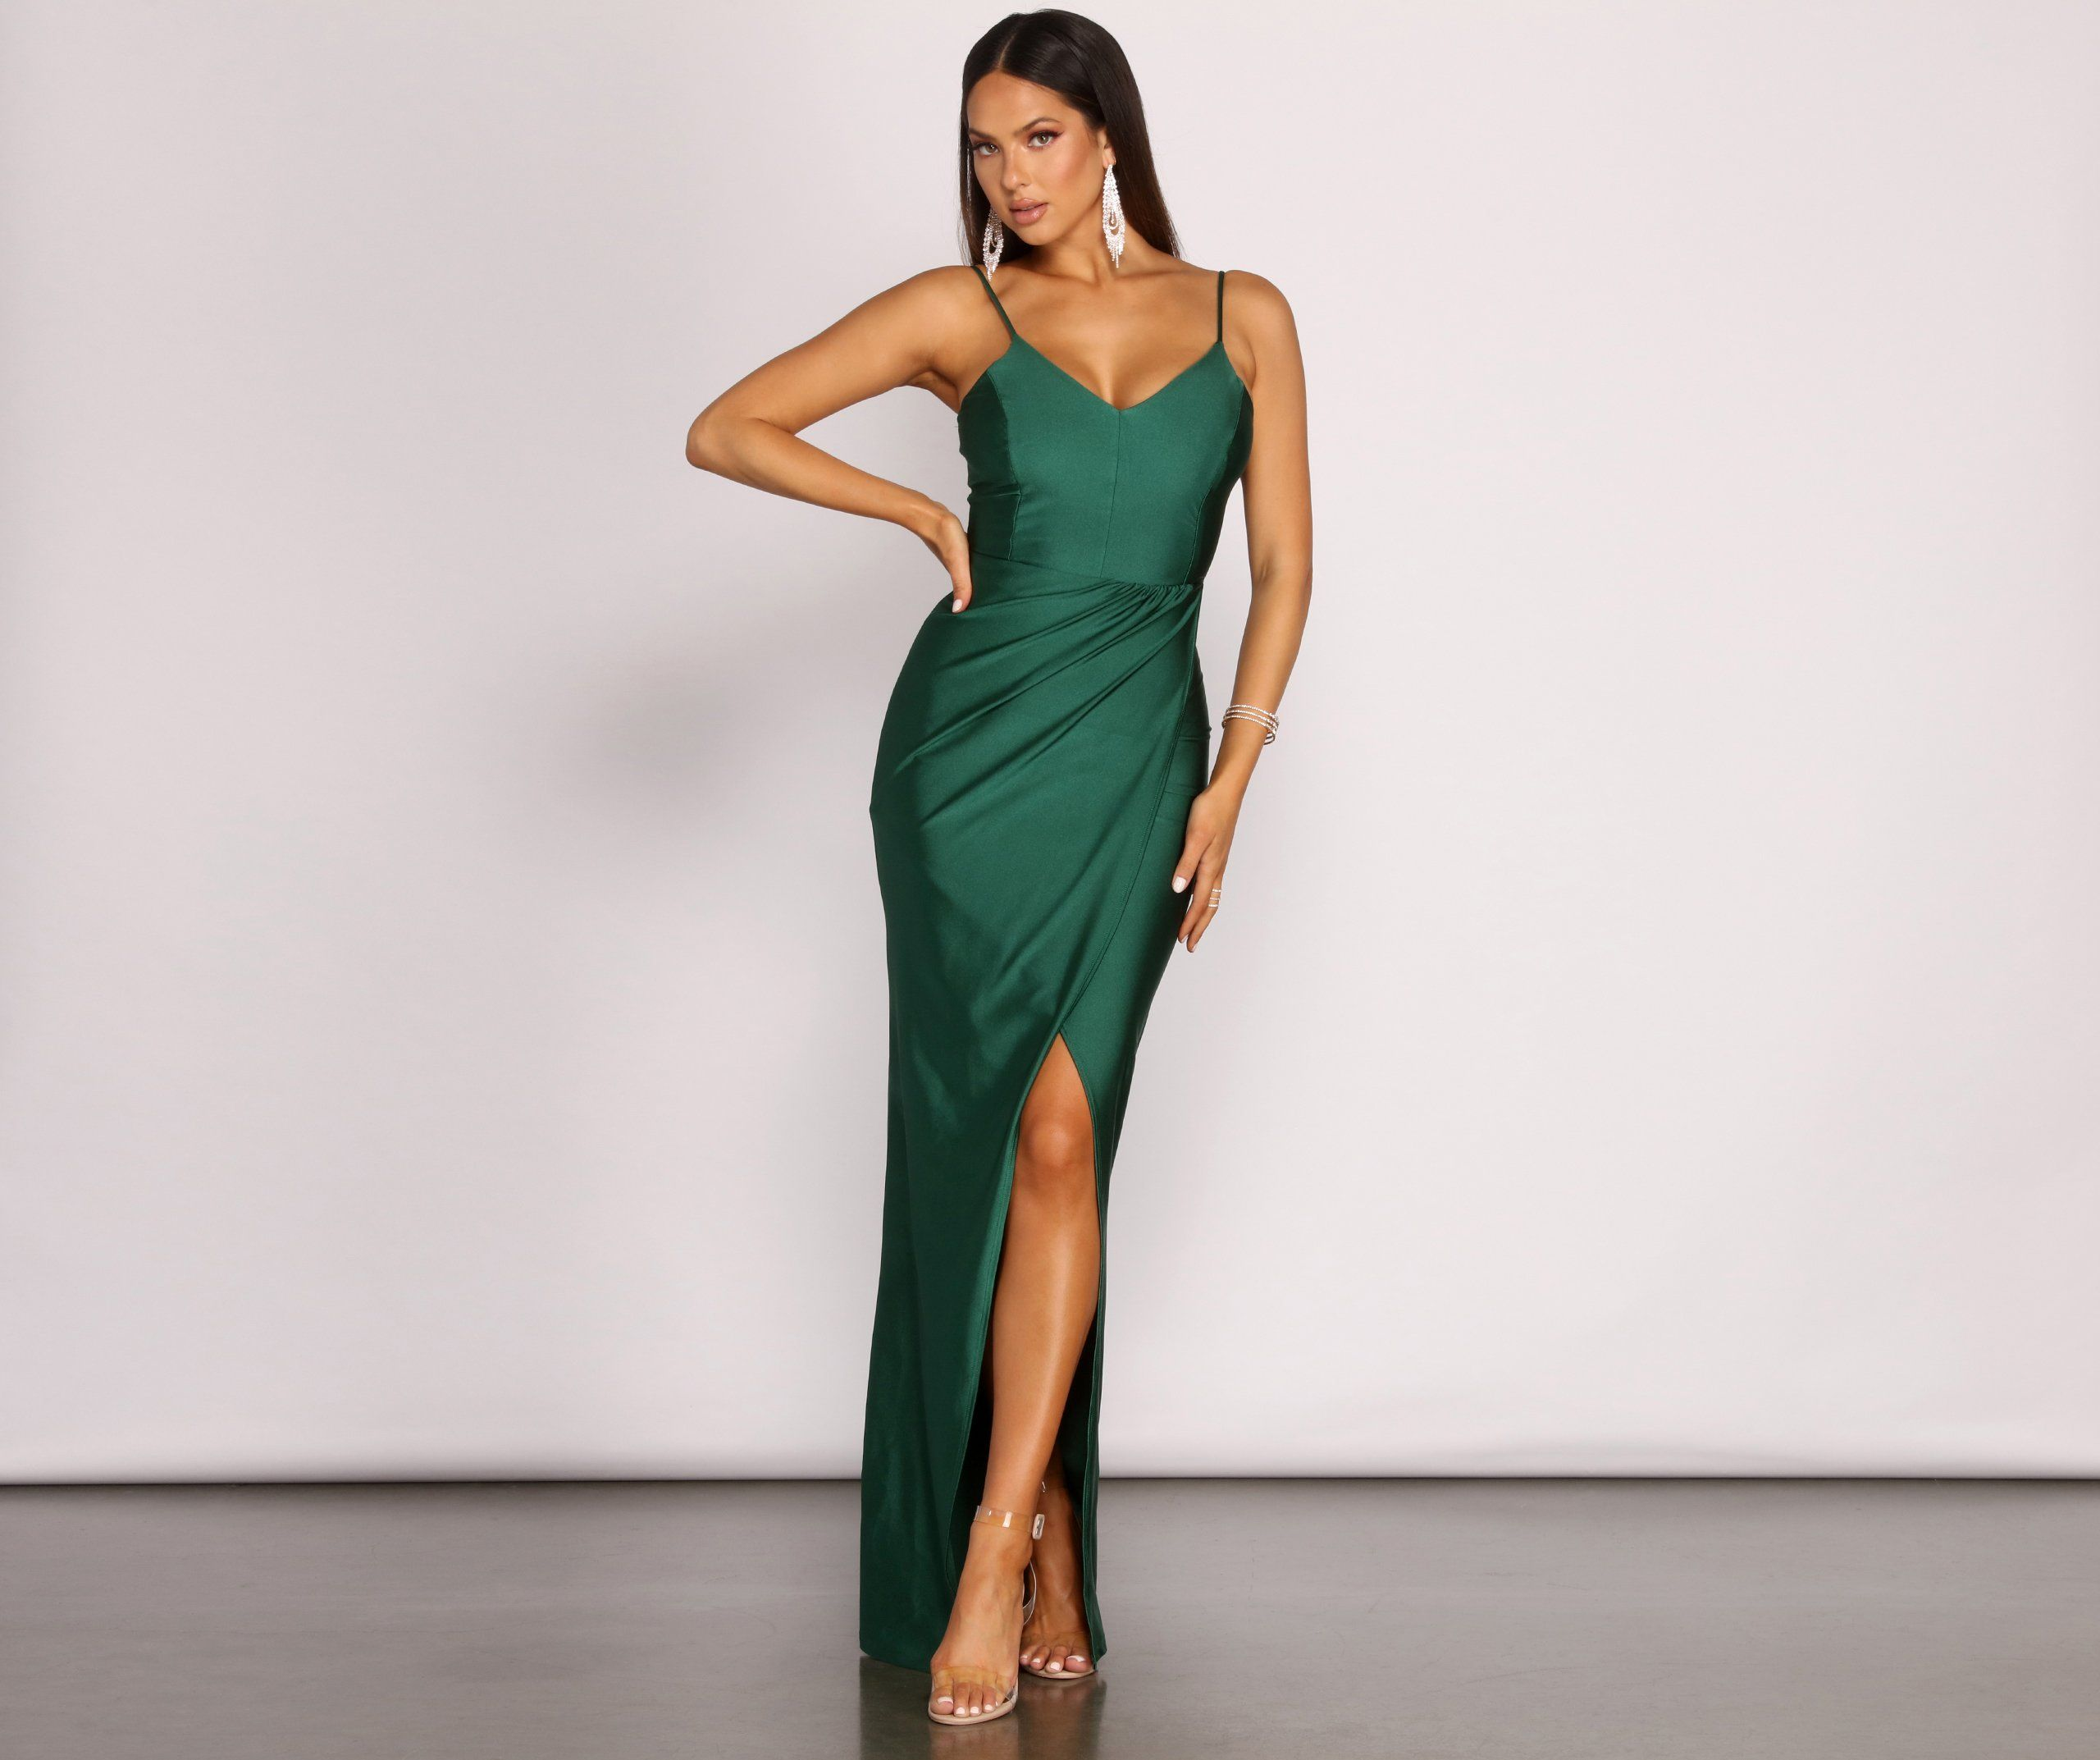 Nicki Formal Wrap Sleeveless Dress In 2021 Green Formal Dresses Lattice Dress Dresses [ 2145 x 2560 Pixel ]